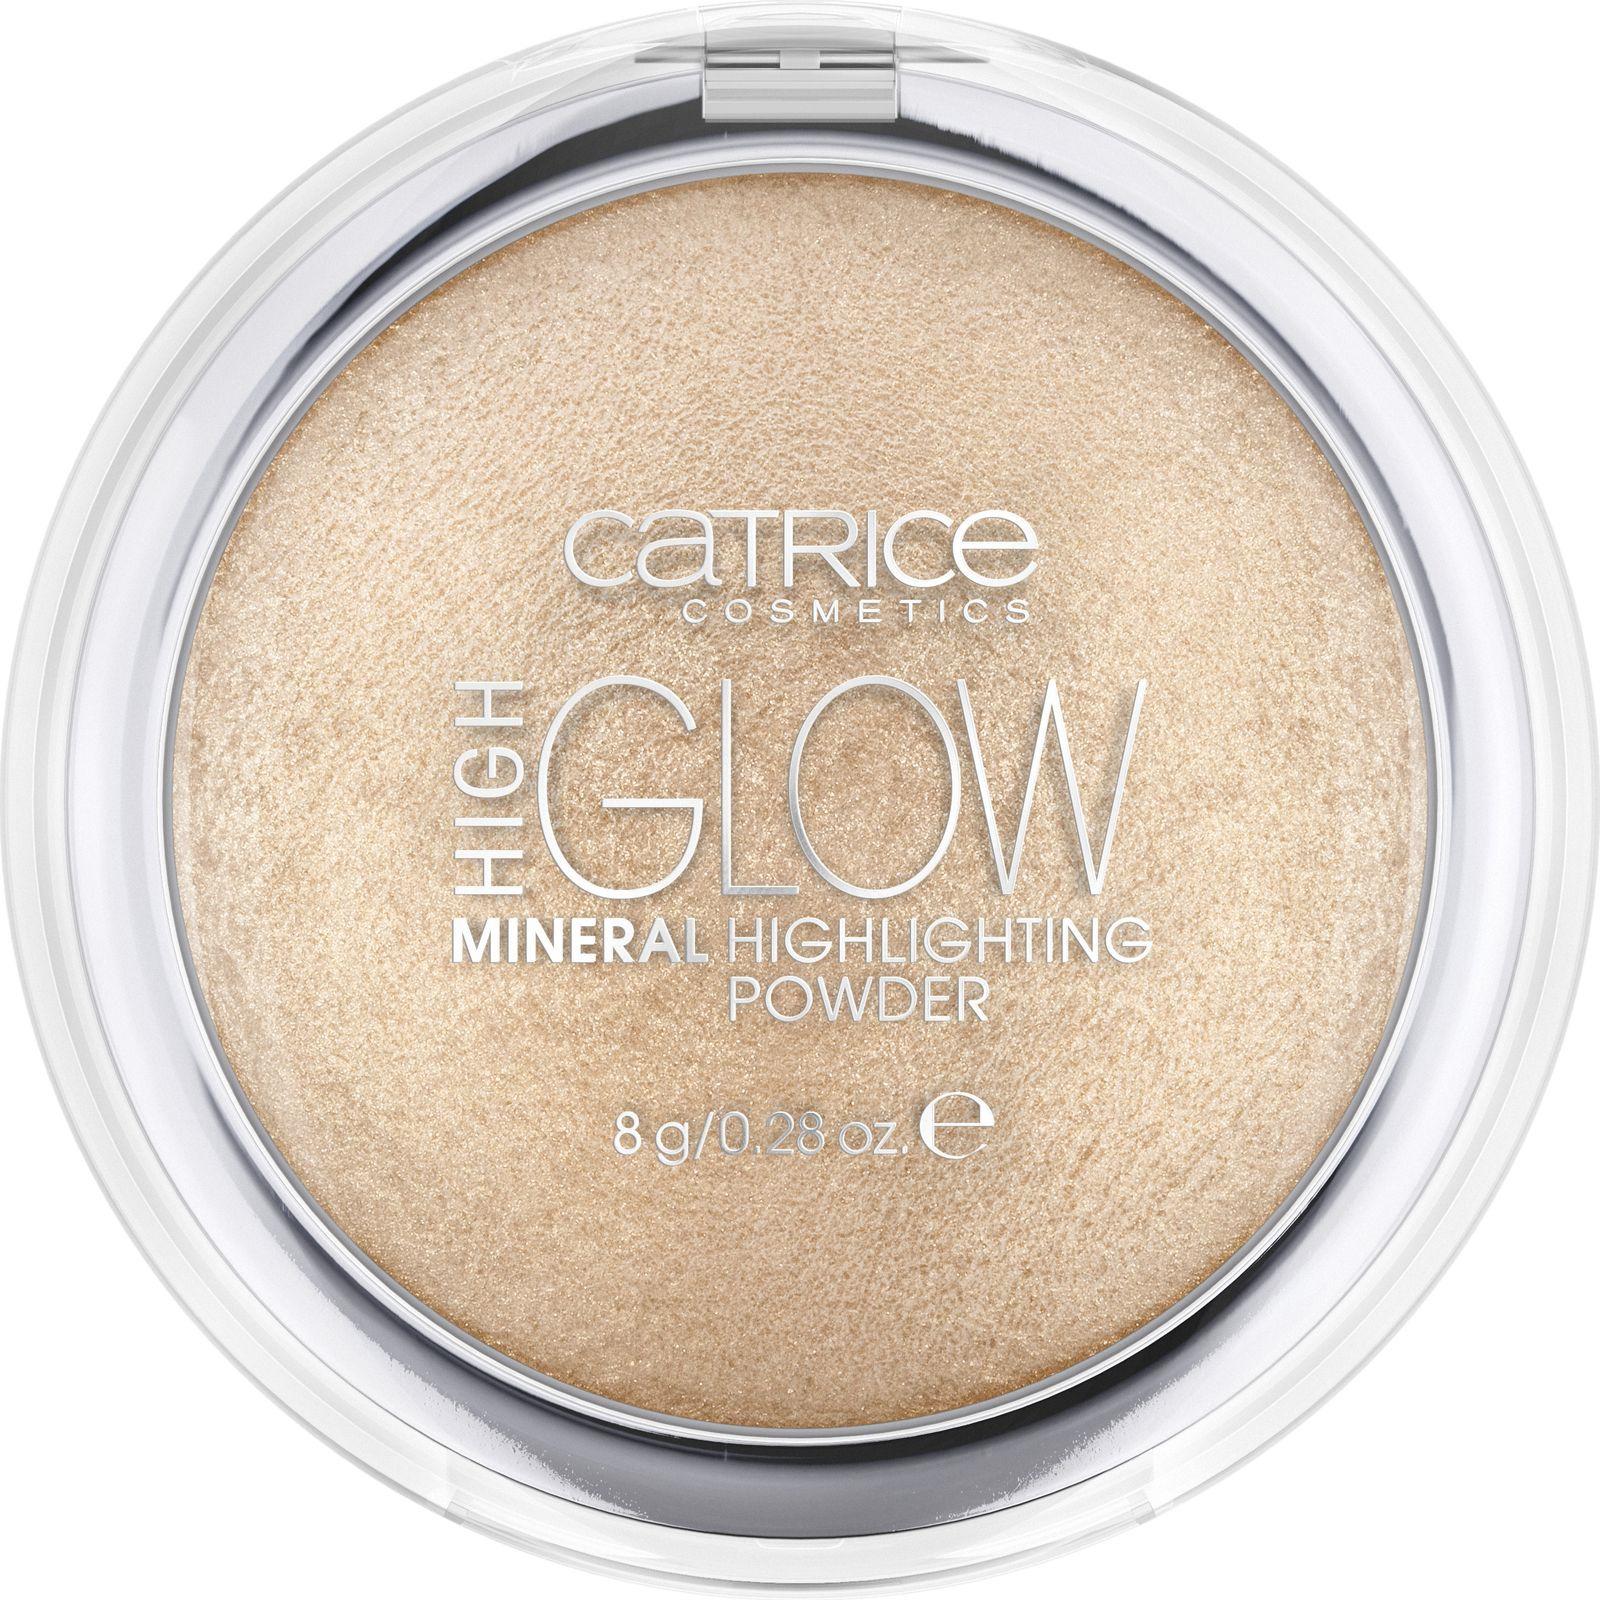 Хайлайтер Catrice High Glow, 040 Pearl Glaze